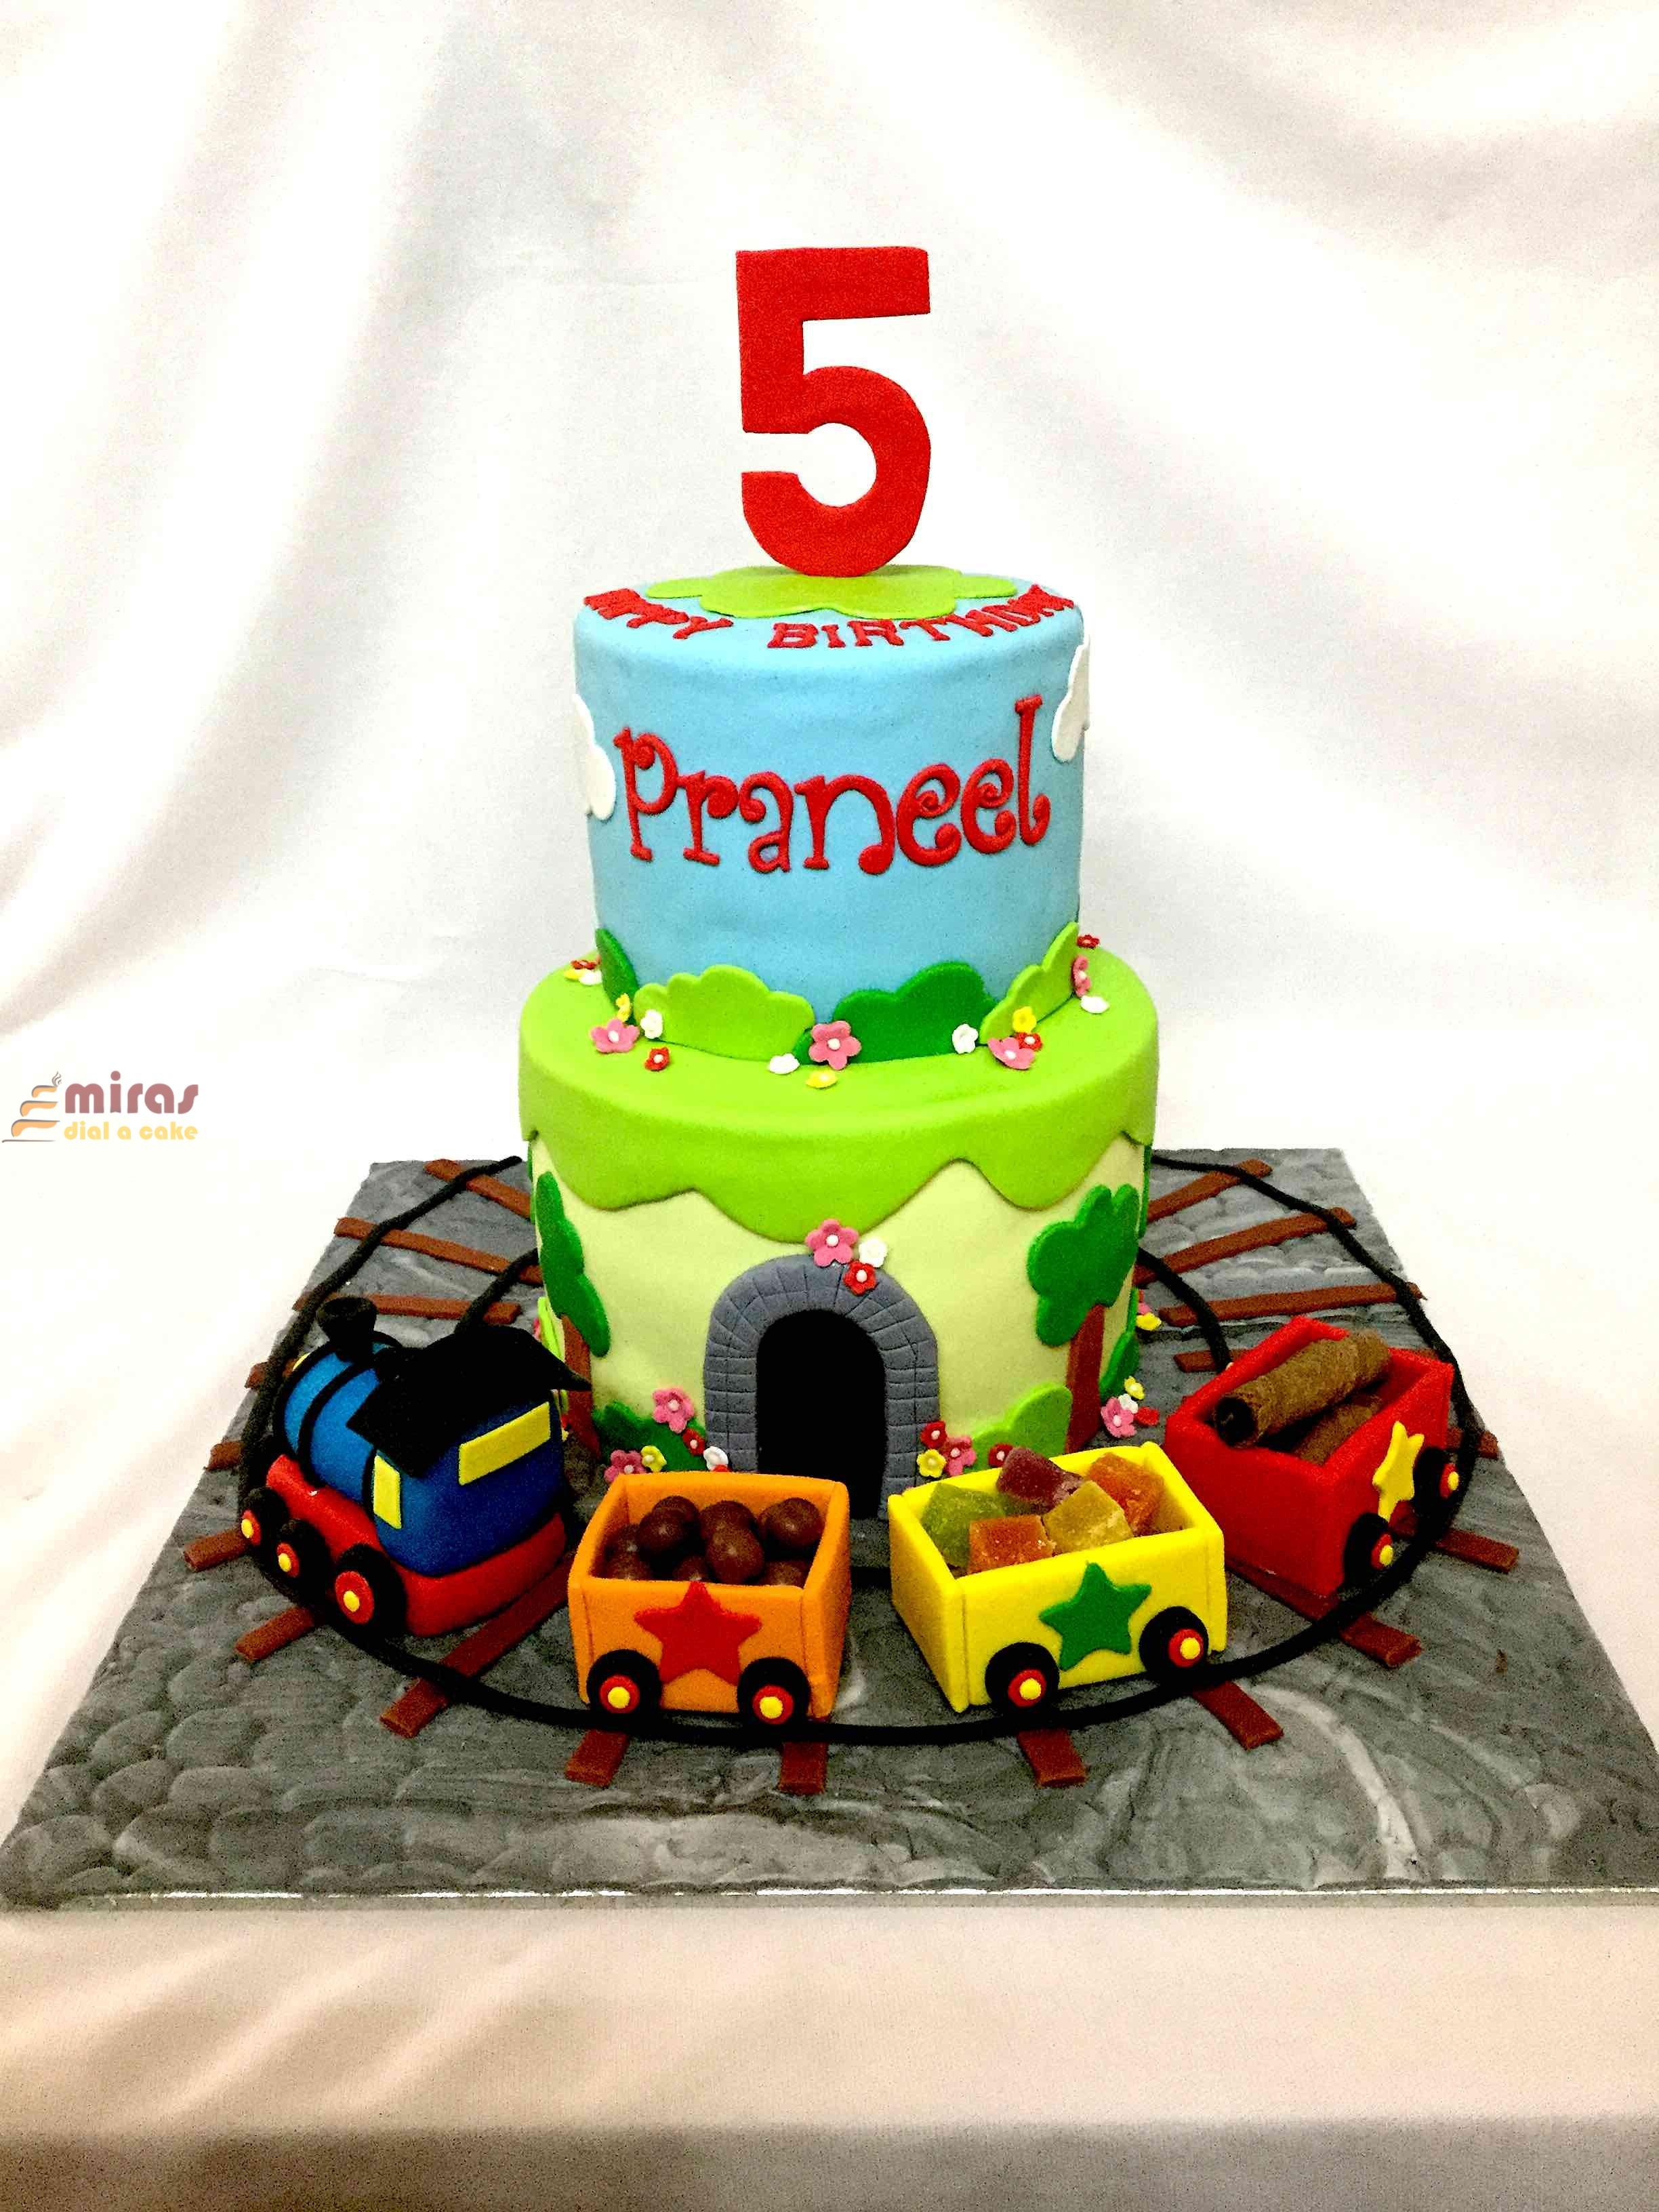 Awe Inspiring Online Thomas Engine Birthday Cakes Order Custom Theme Cake Birthday Cards Printable Nowaargucafe Filternl